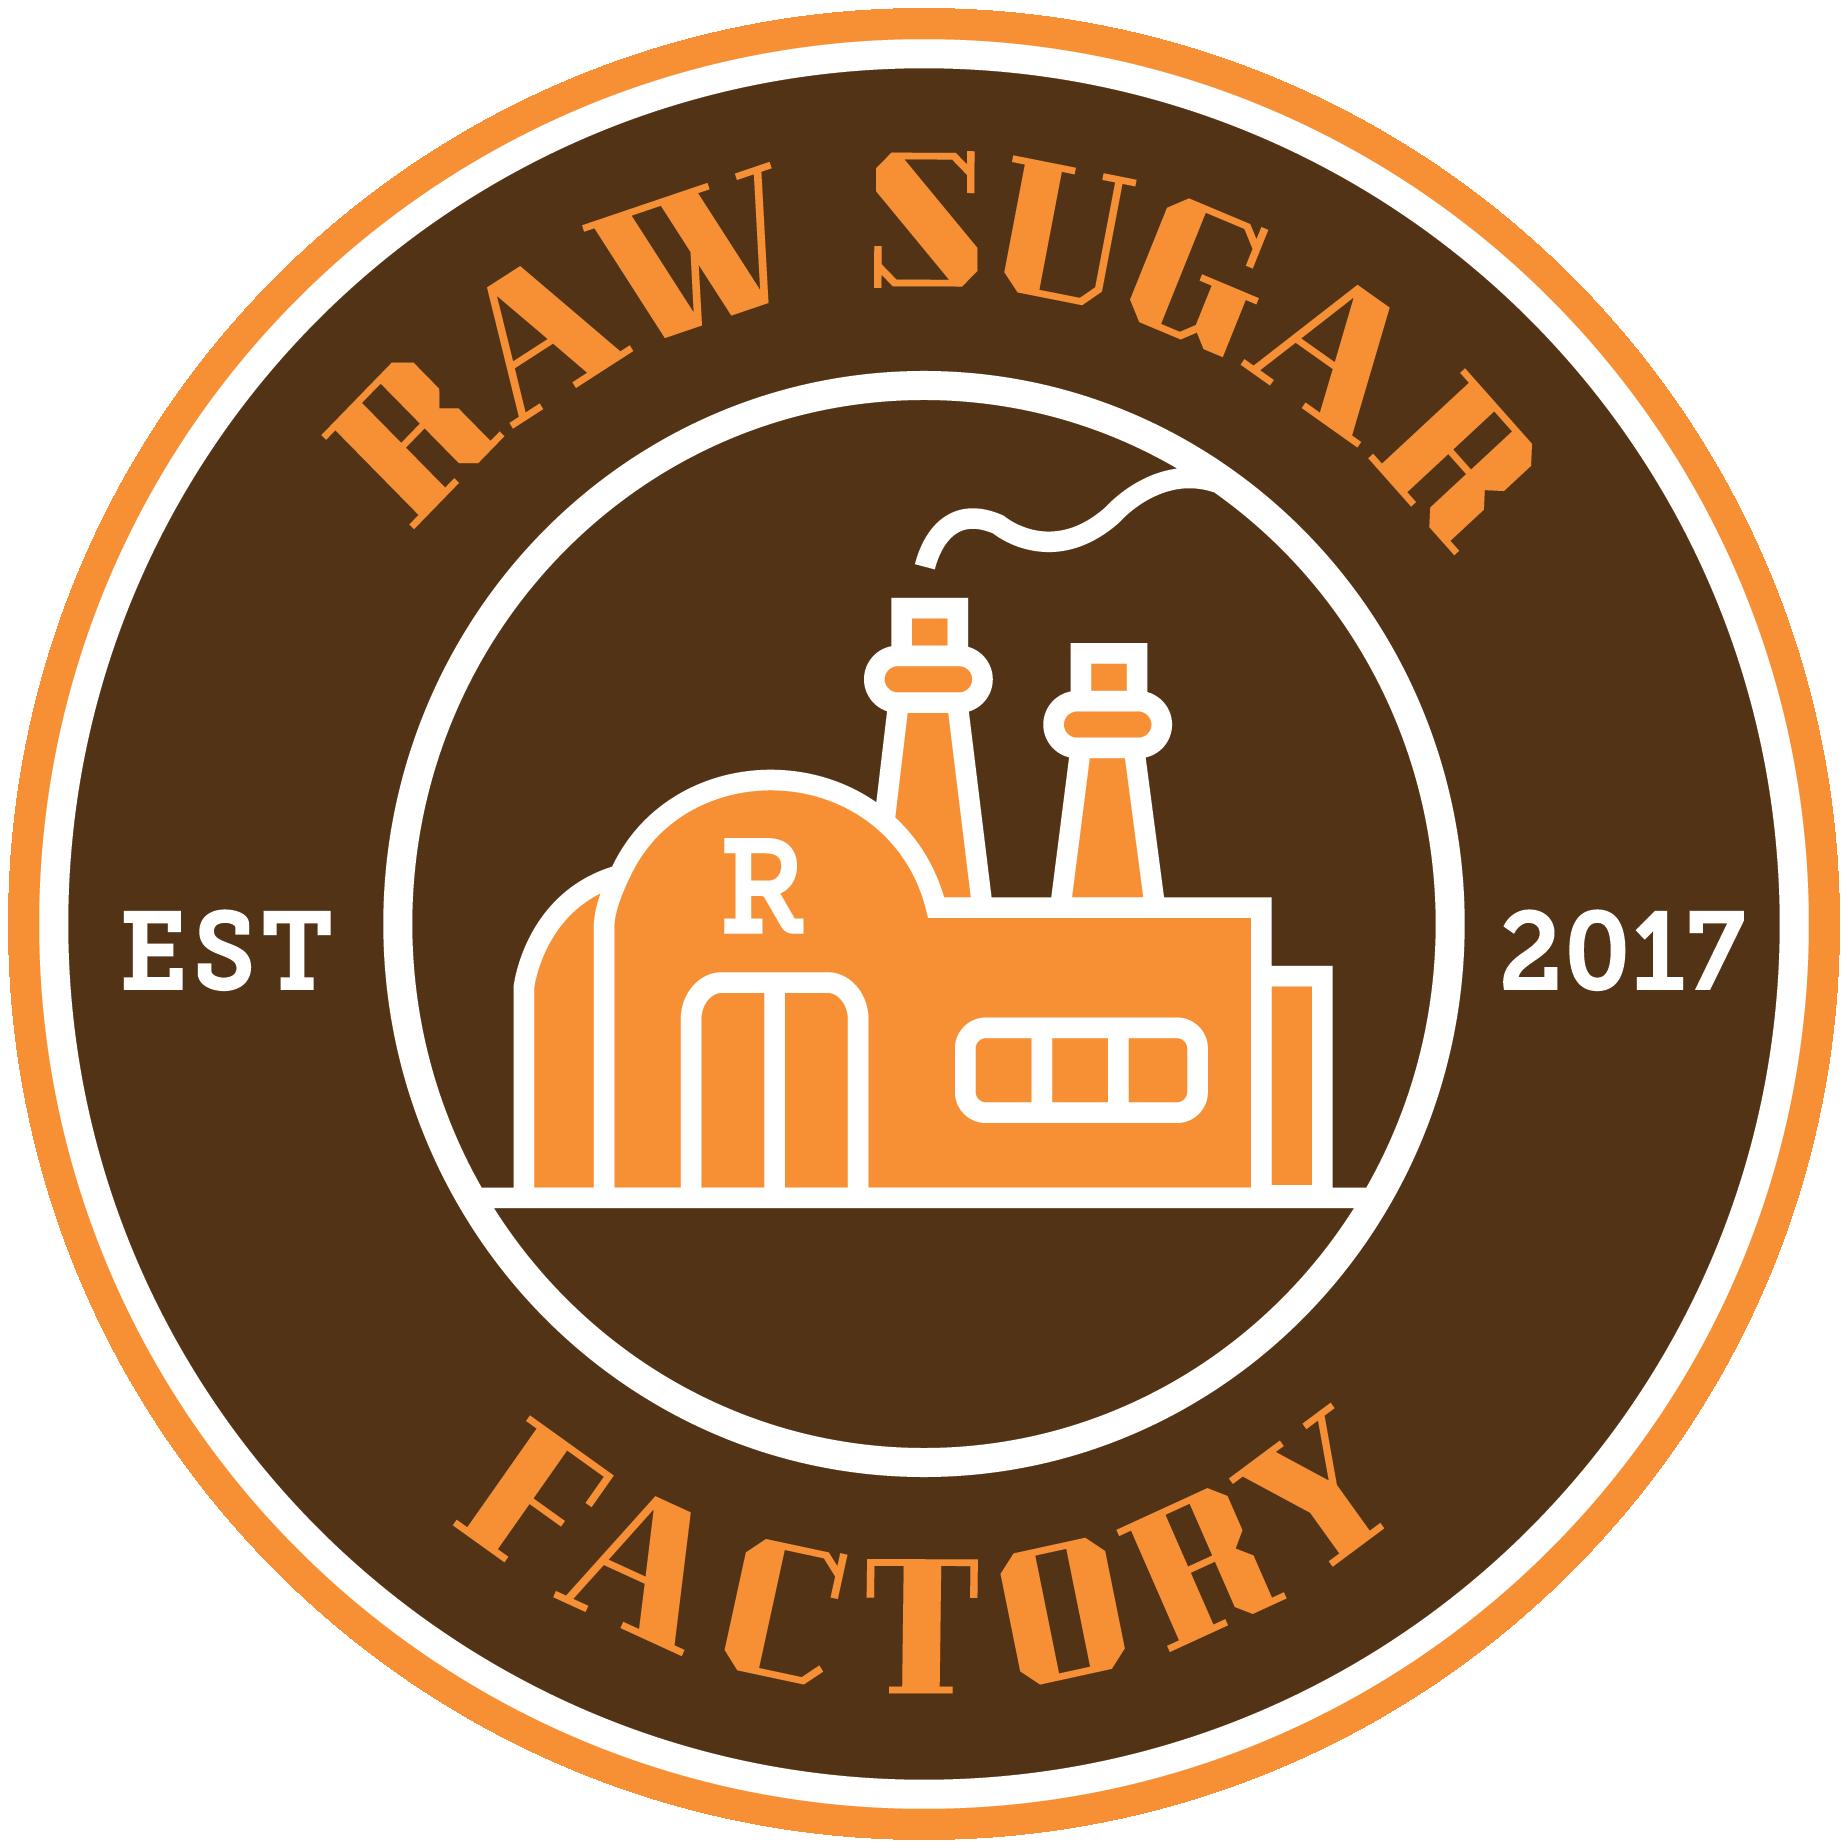 Rawsugar logo color png. Factories clipart sugar industry